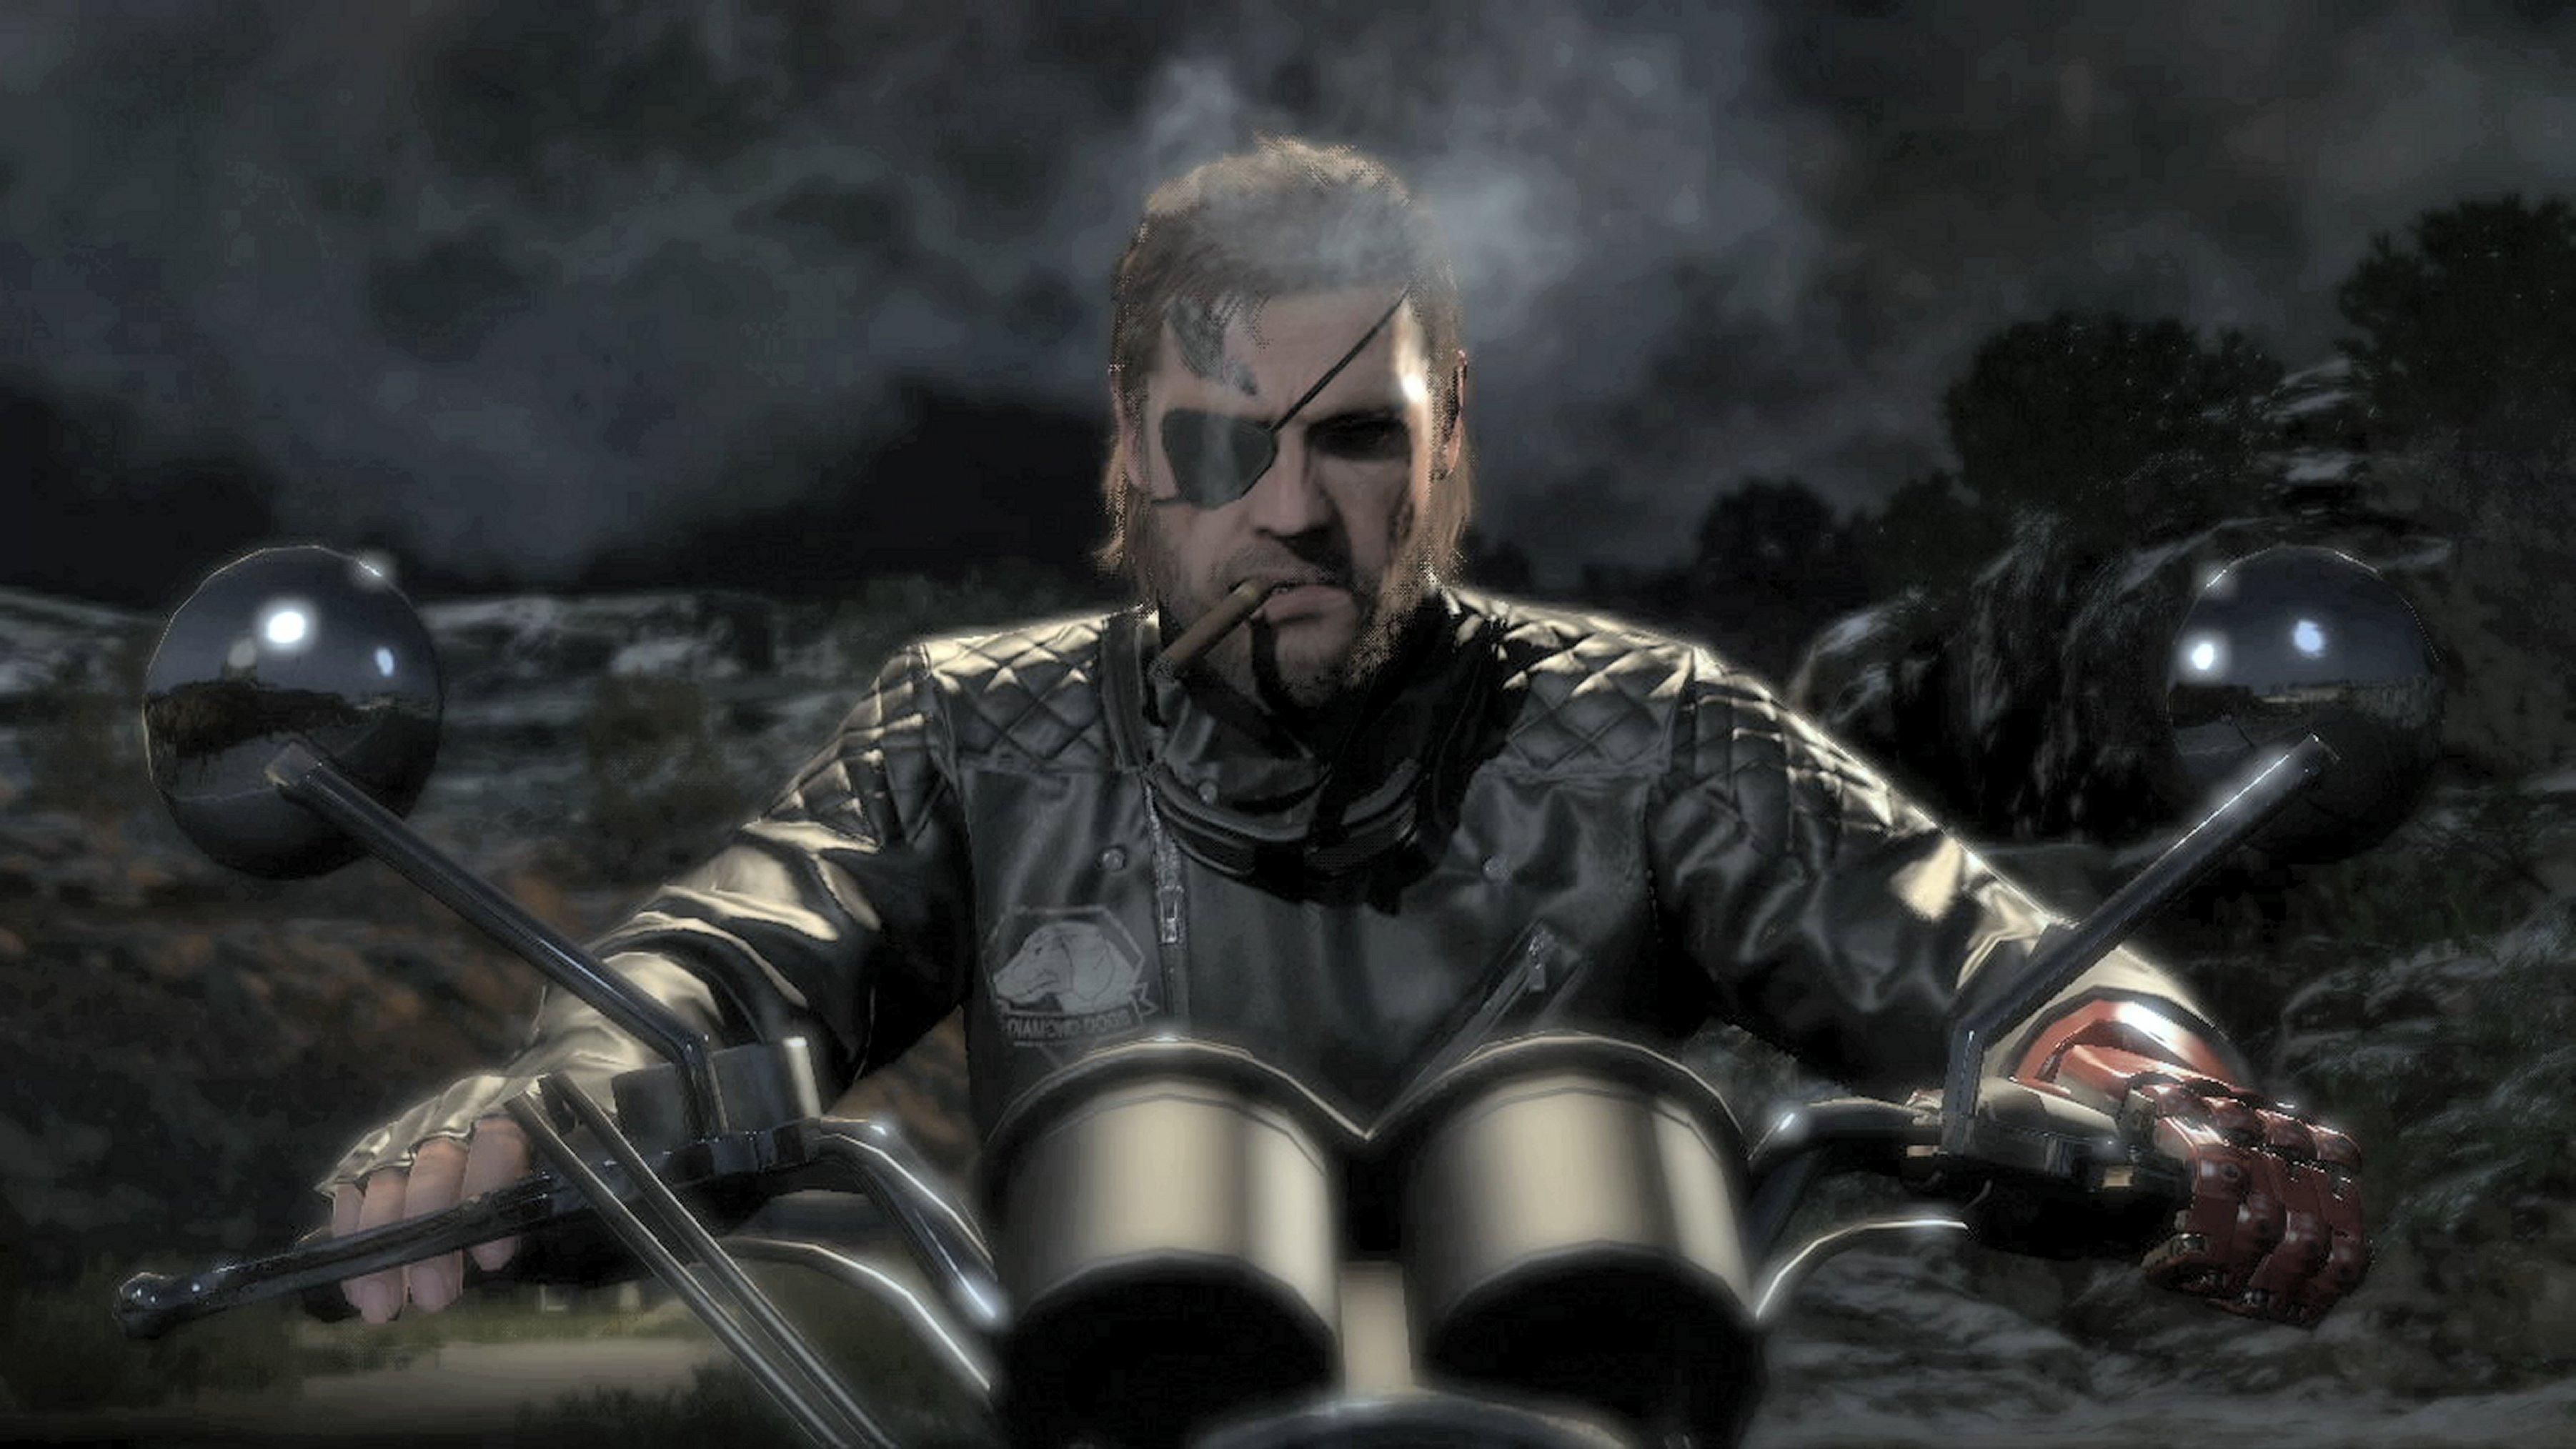 Metal Gear Solid 5 The Phantom Pain MGSV_TPP